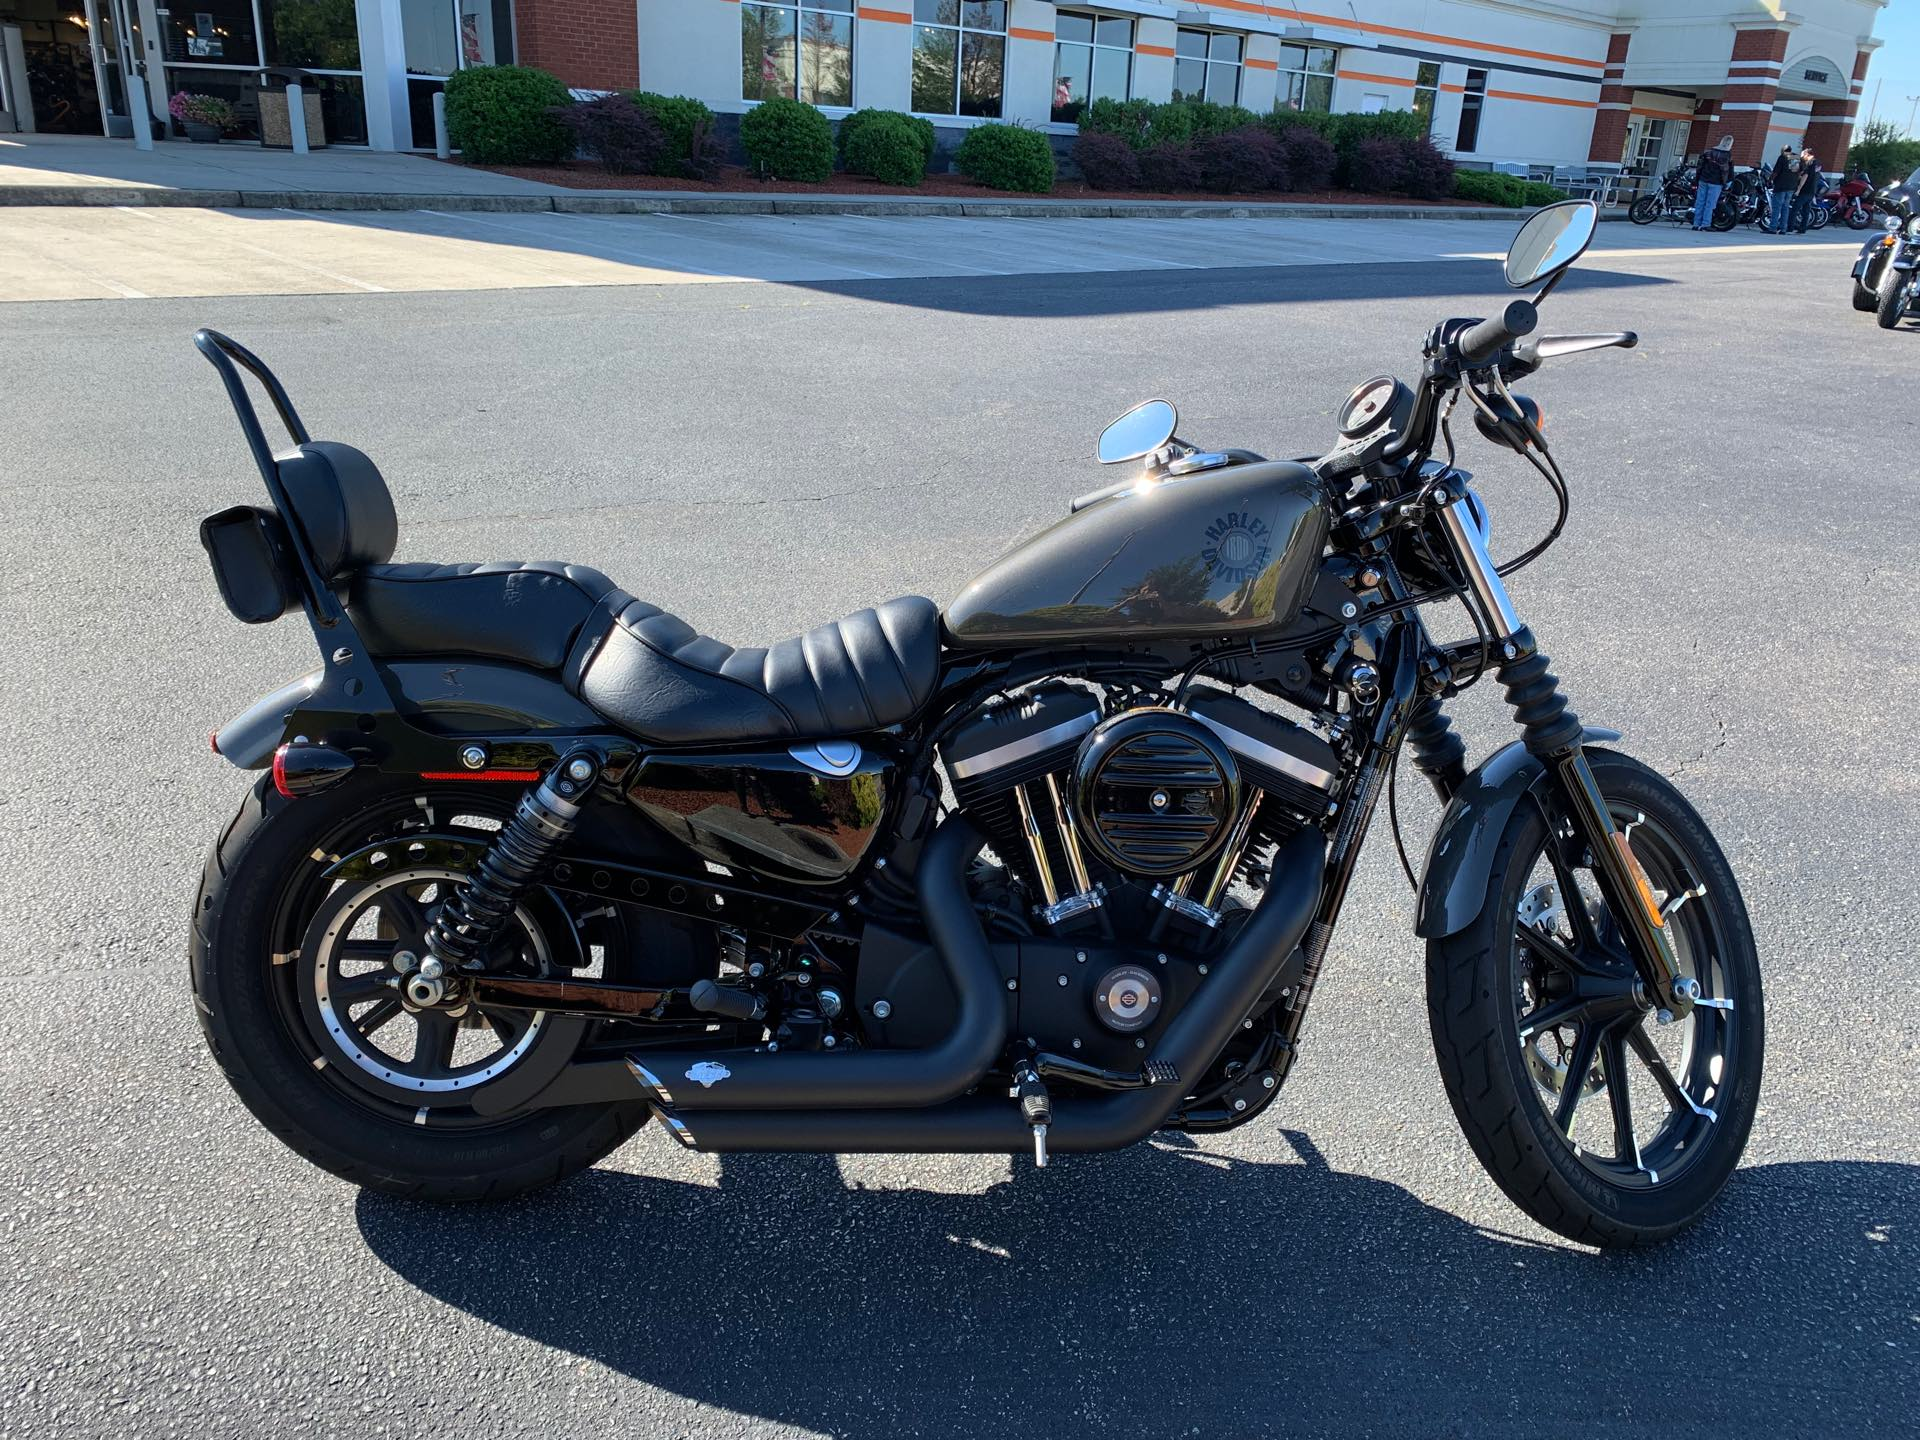 2019 Harley-Davidson Sportster Iron 883 at Colonial Harley-Davidson